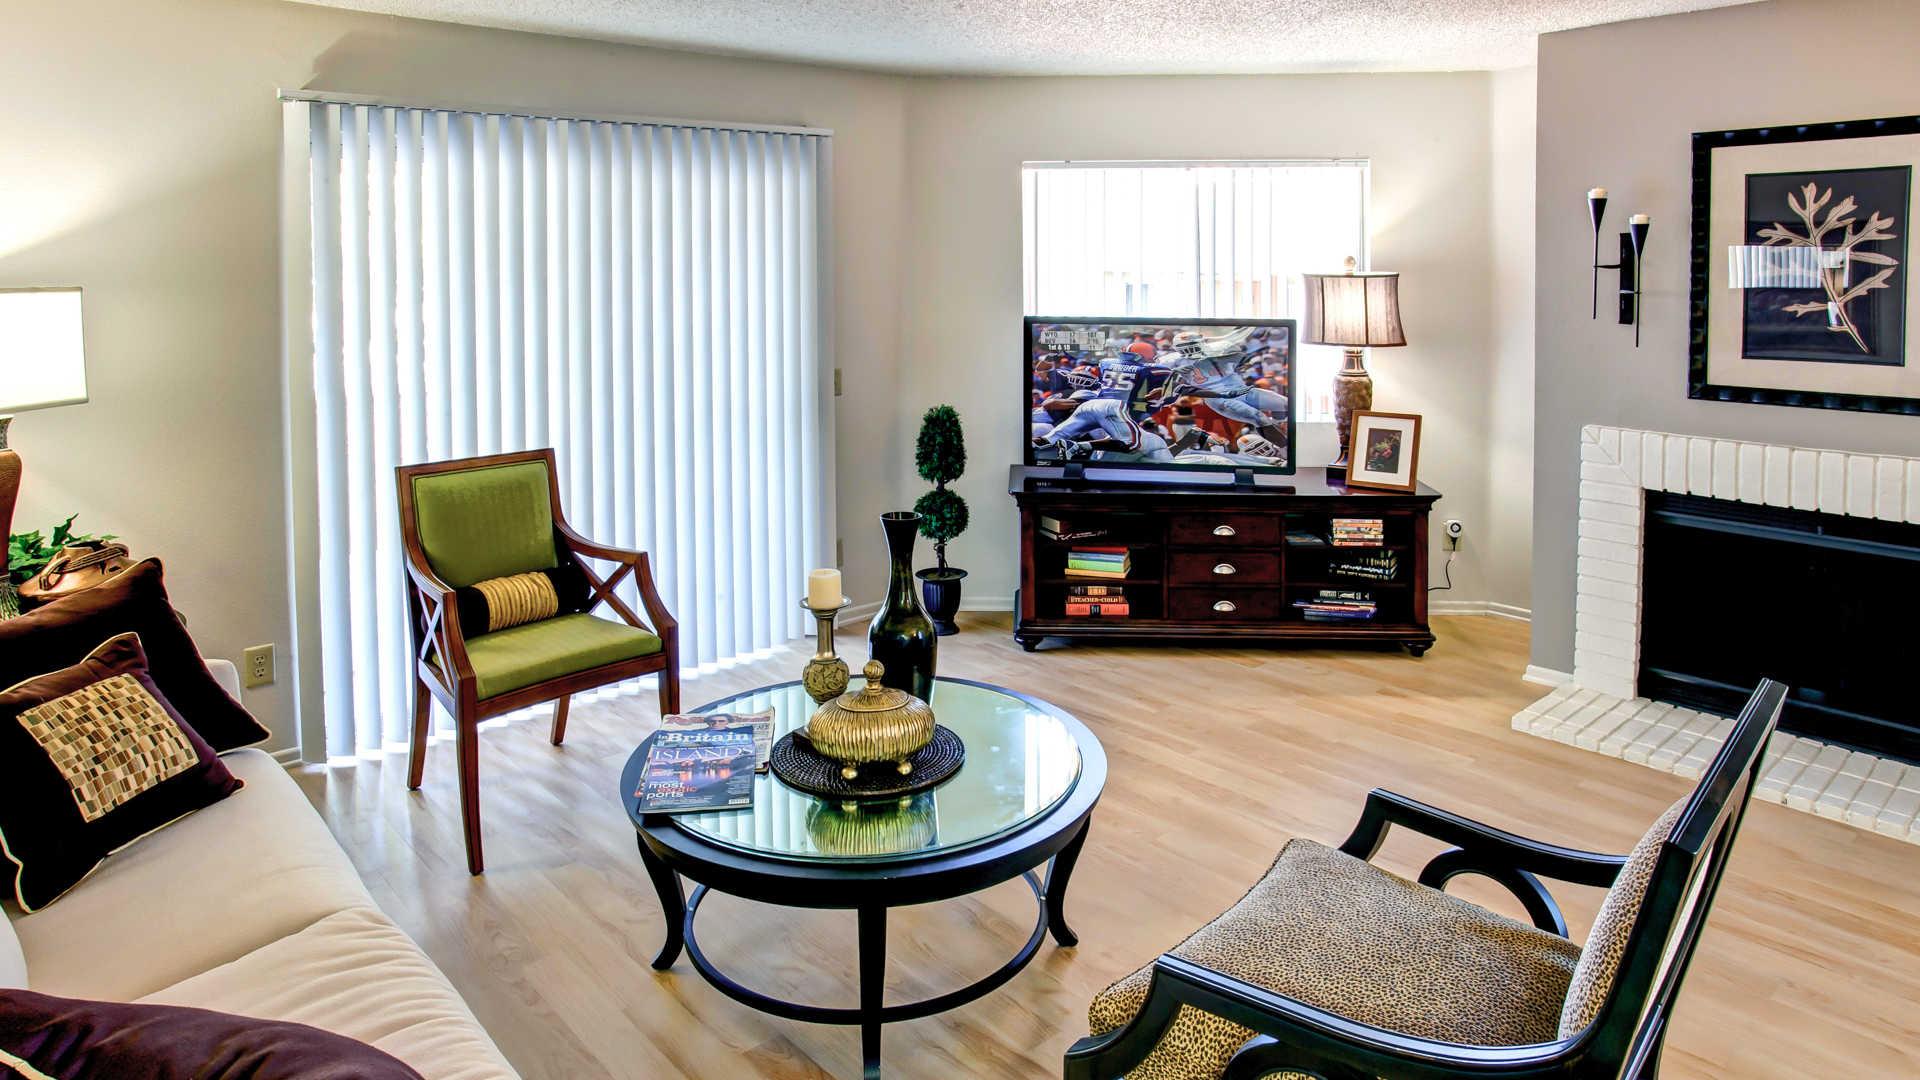 Villa Solana Apartments reviews in Laguna Hills Moulton Pkwy